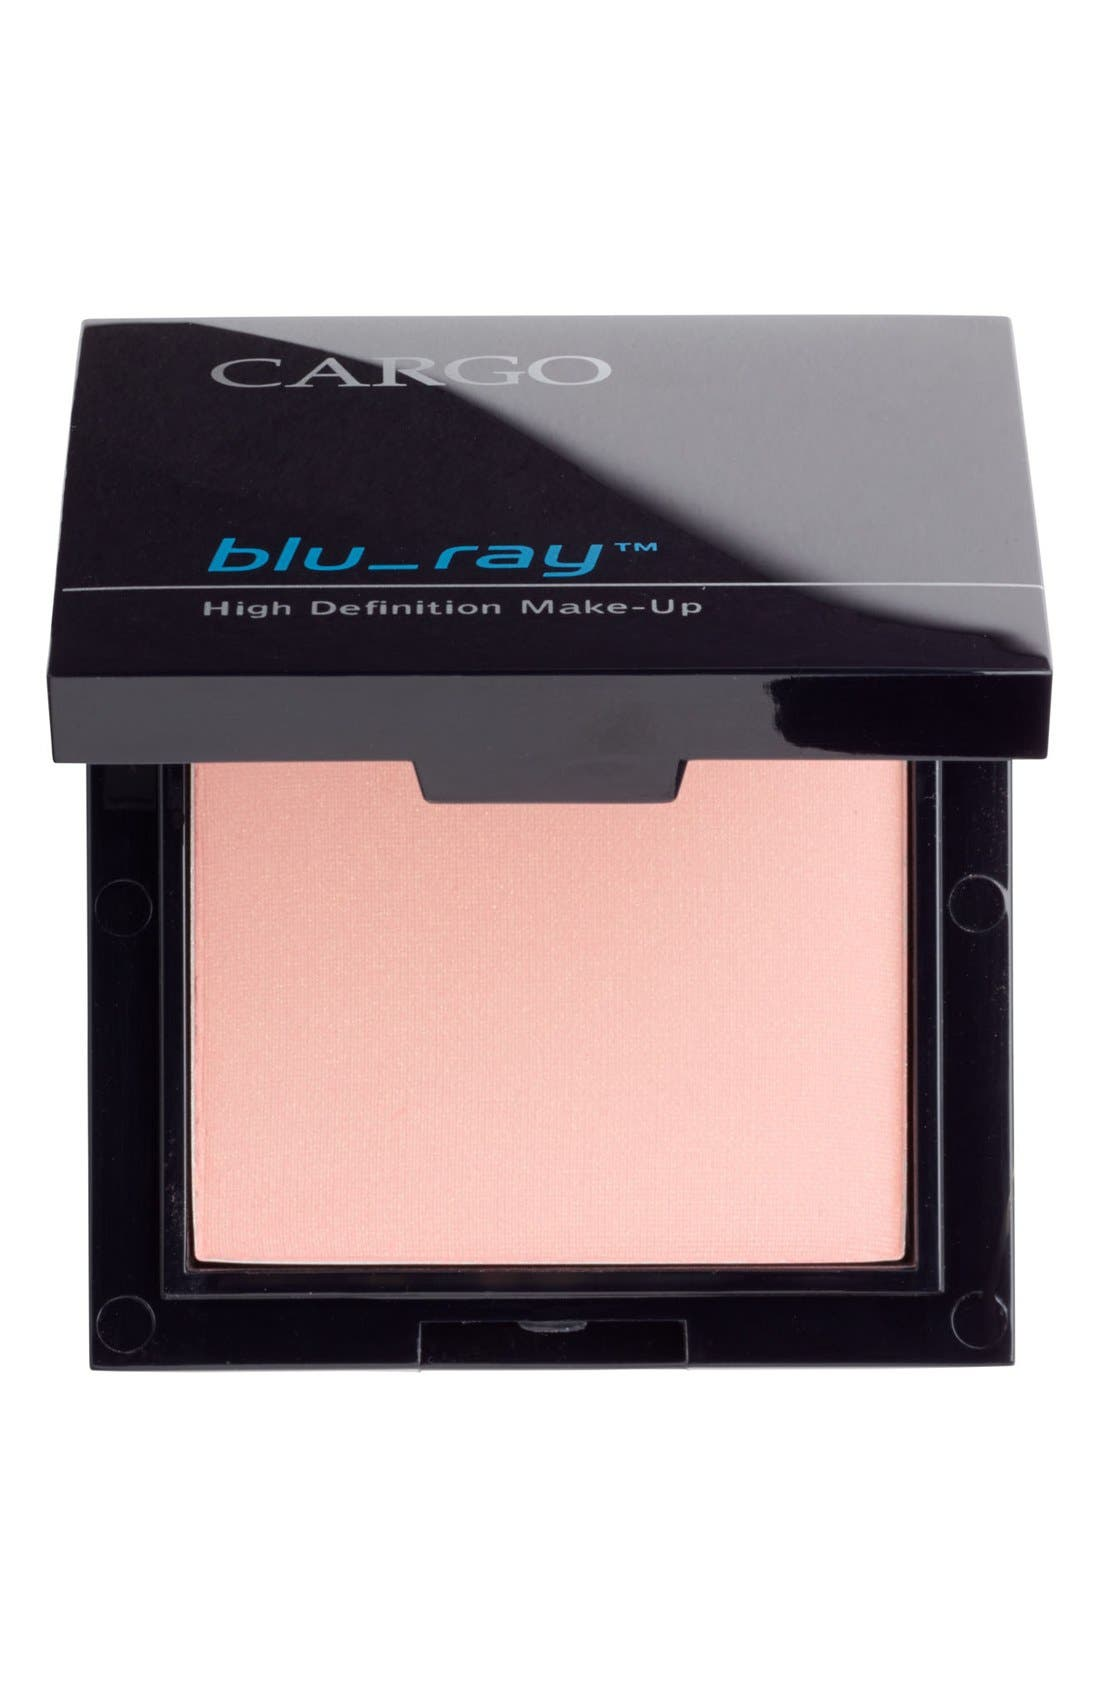 CARGO 'blu_ray™' High Definition Blush/Highlighter